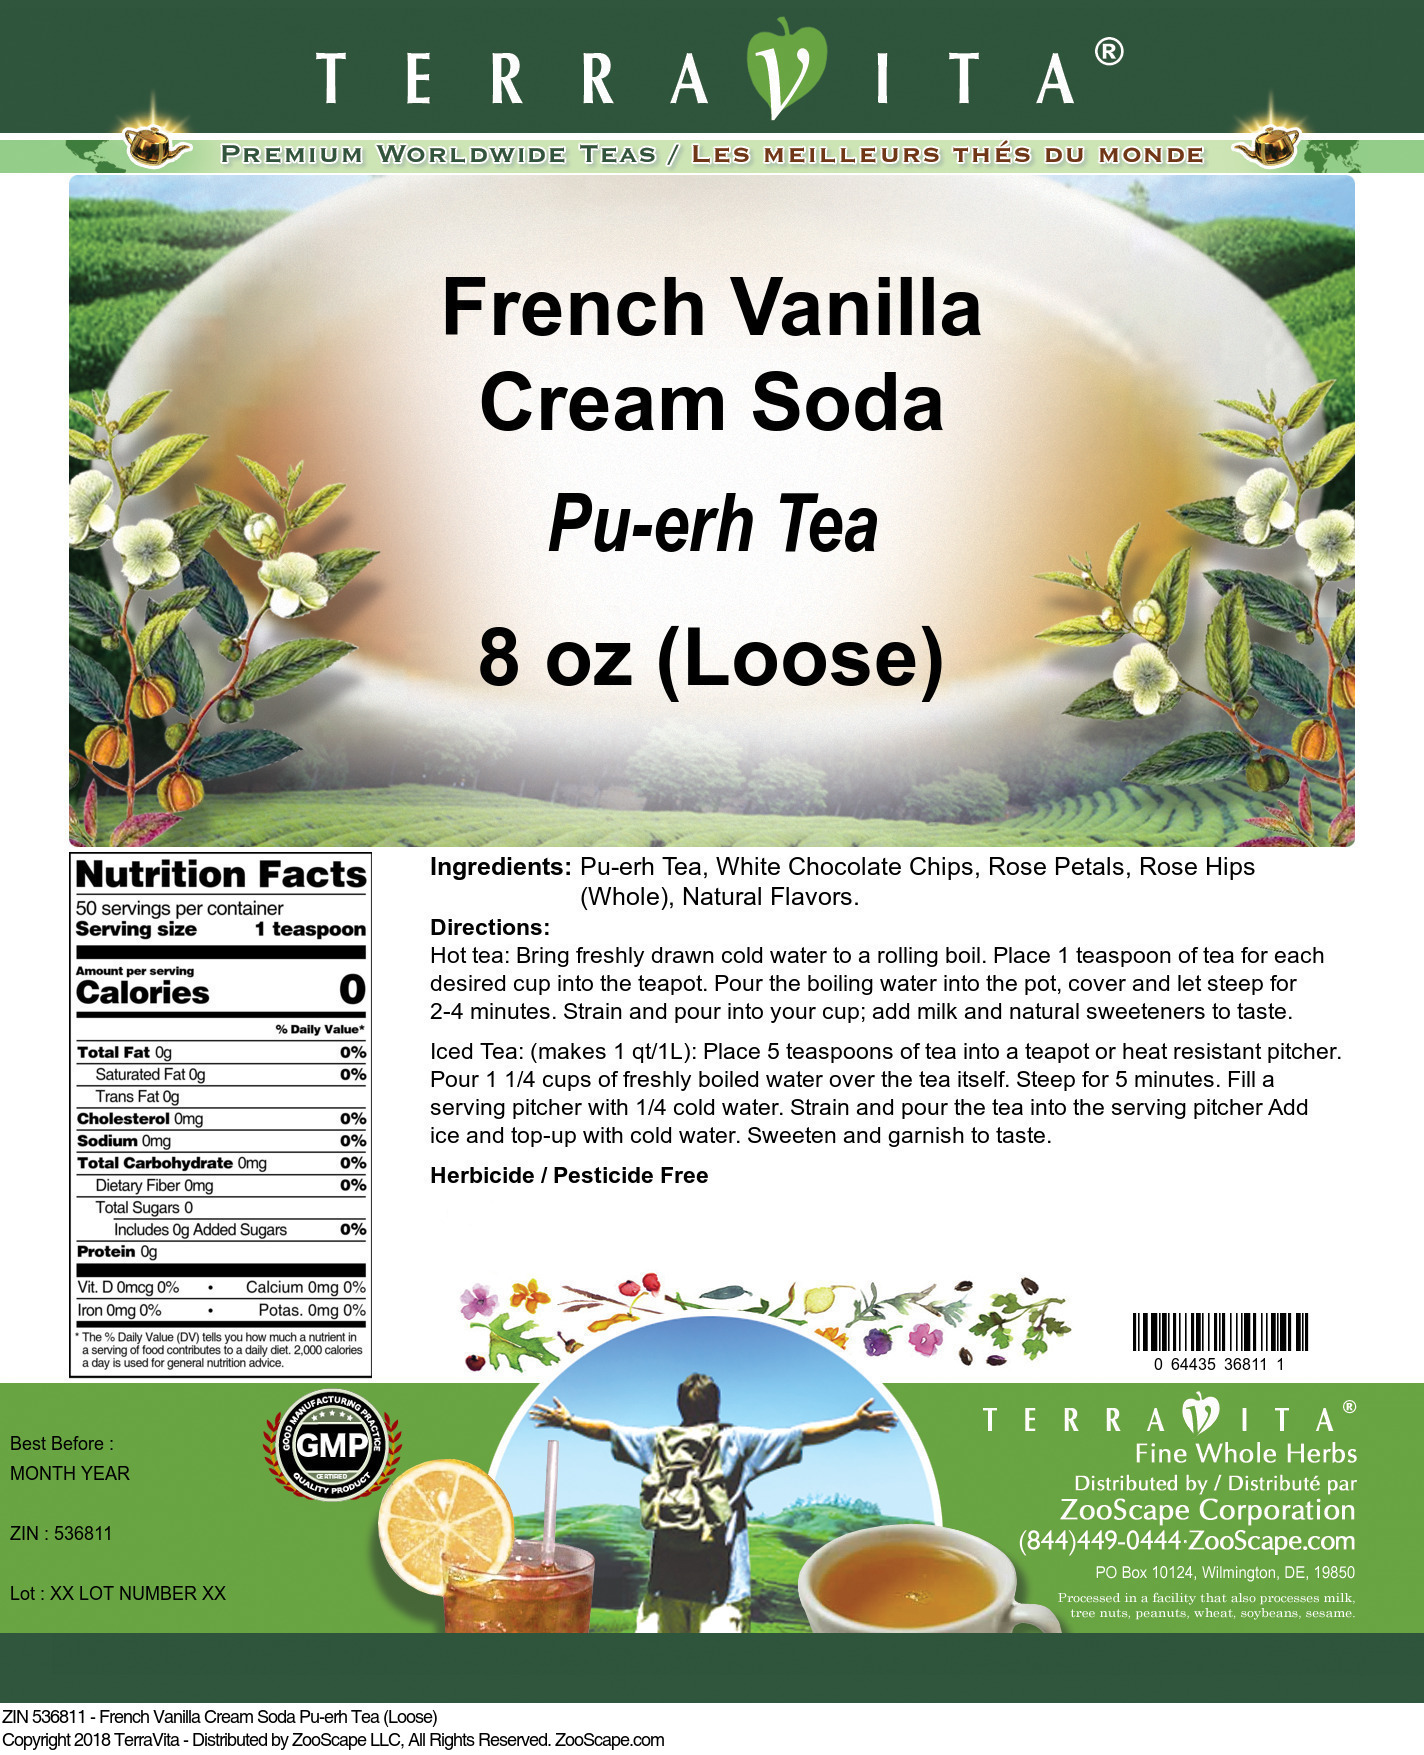 French Vanilla Cream Soda Pu-erh Tea (Loose)